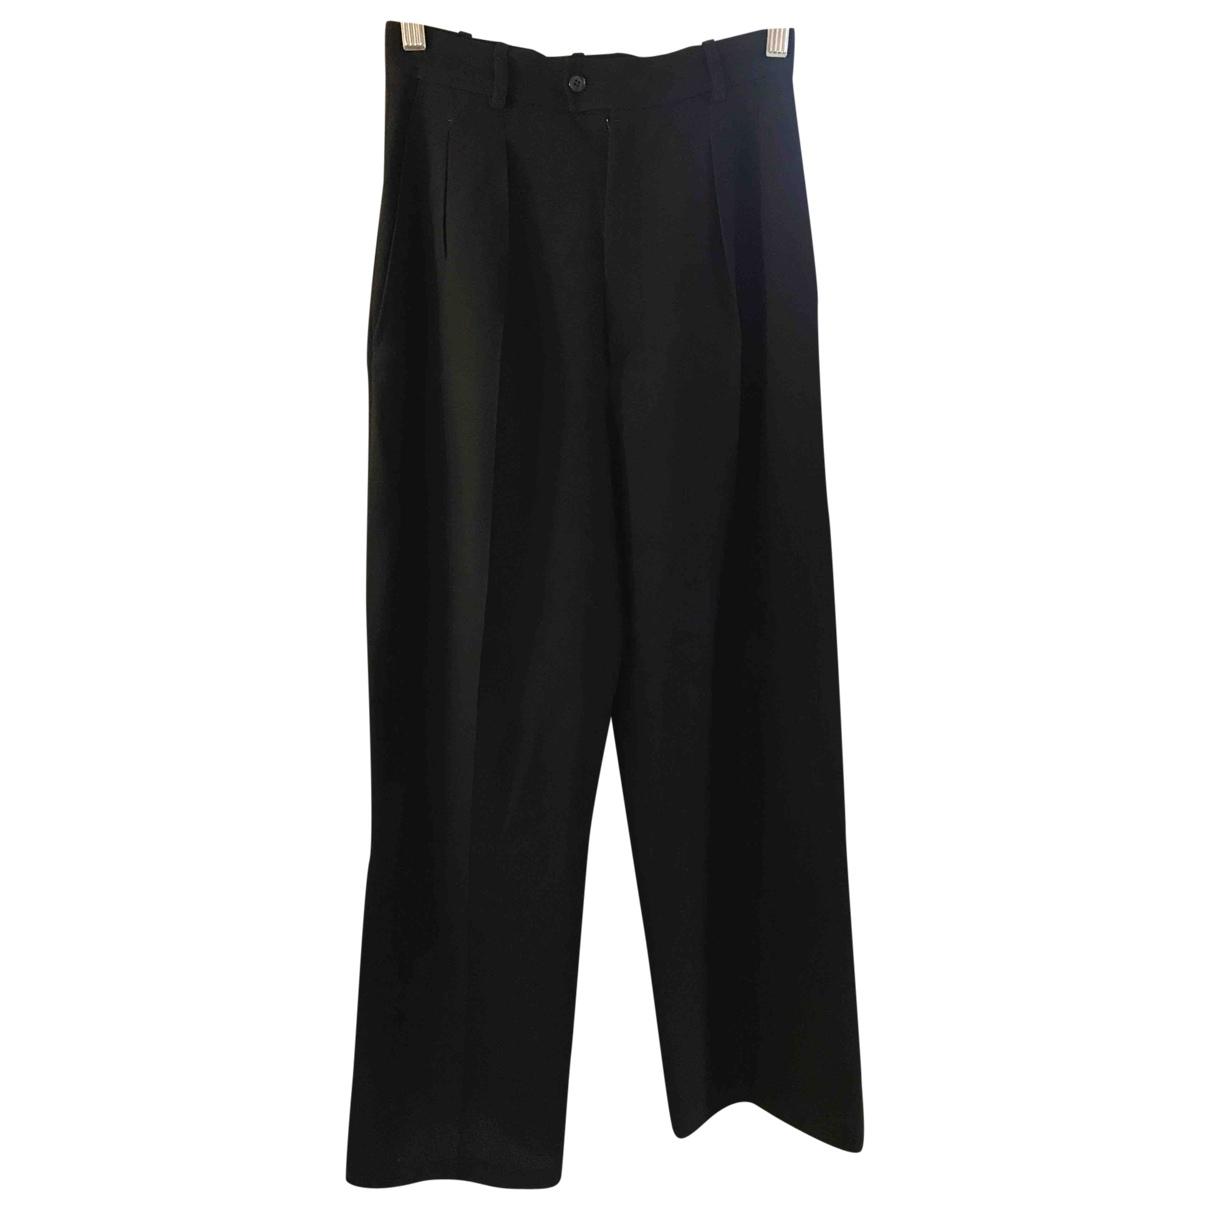 Pantalon recto de Lana Yves Saint Laurent